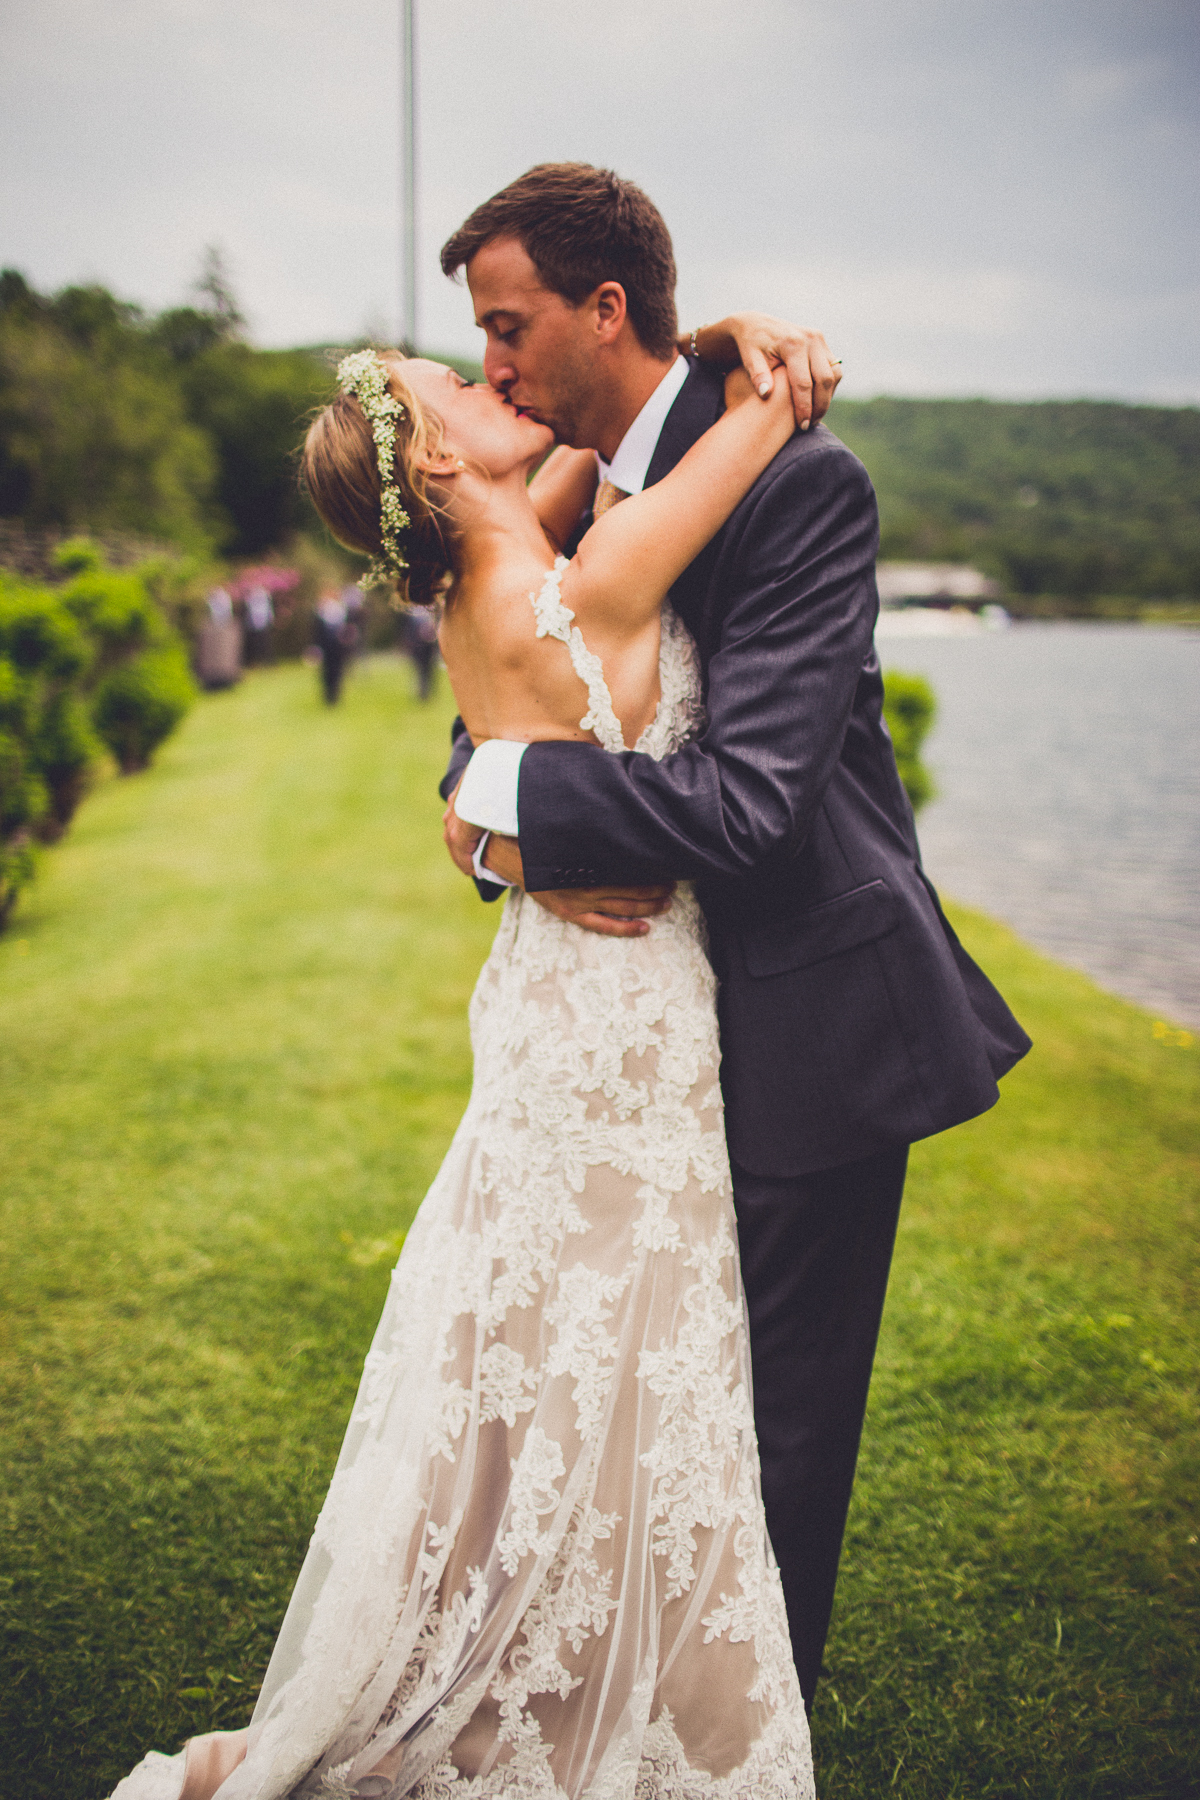 taylor-travis-grandfather-mountain-kelley-raye-north-carolina-wedding-photographer-42.jpg